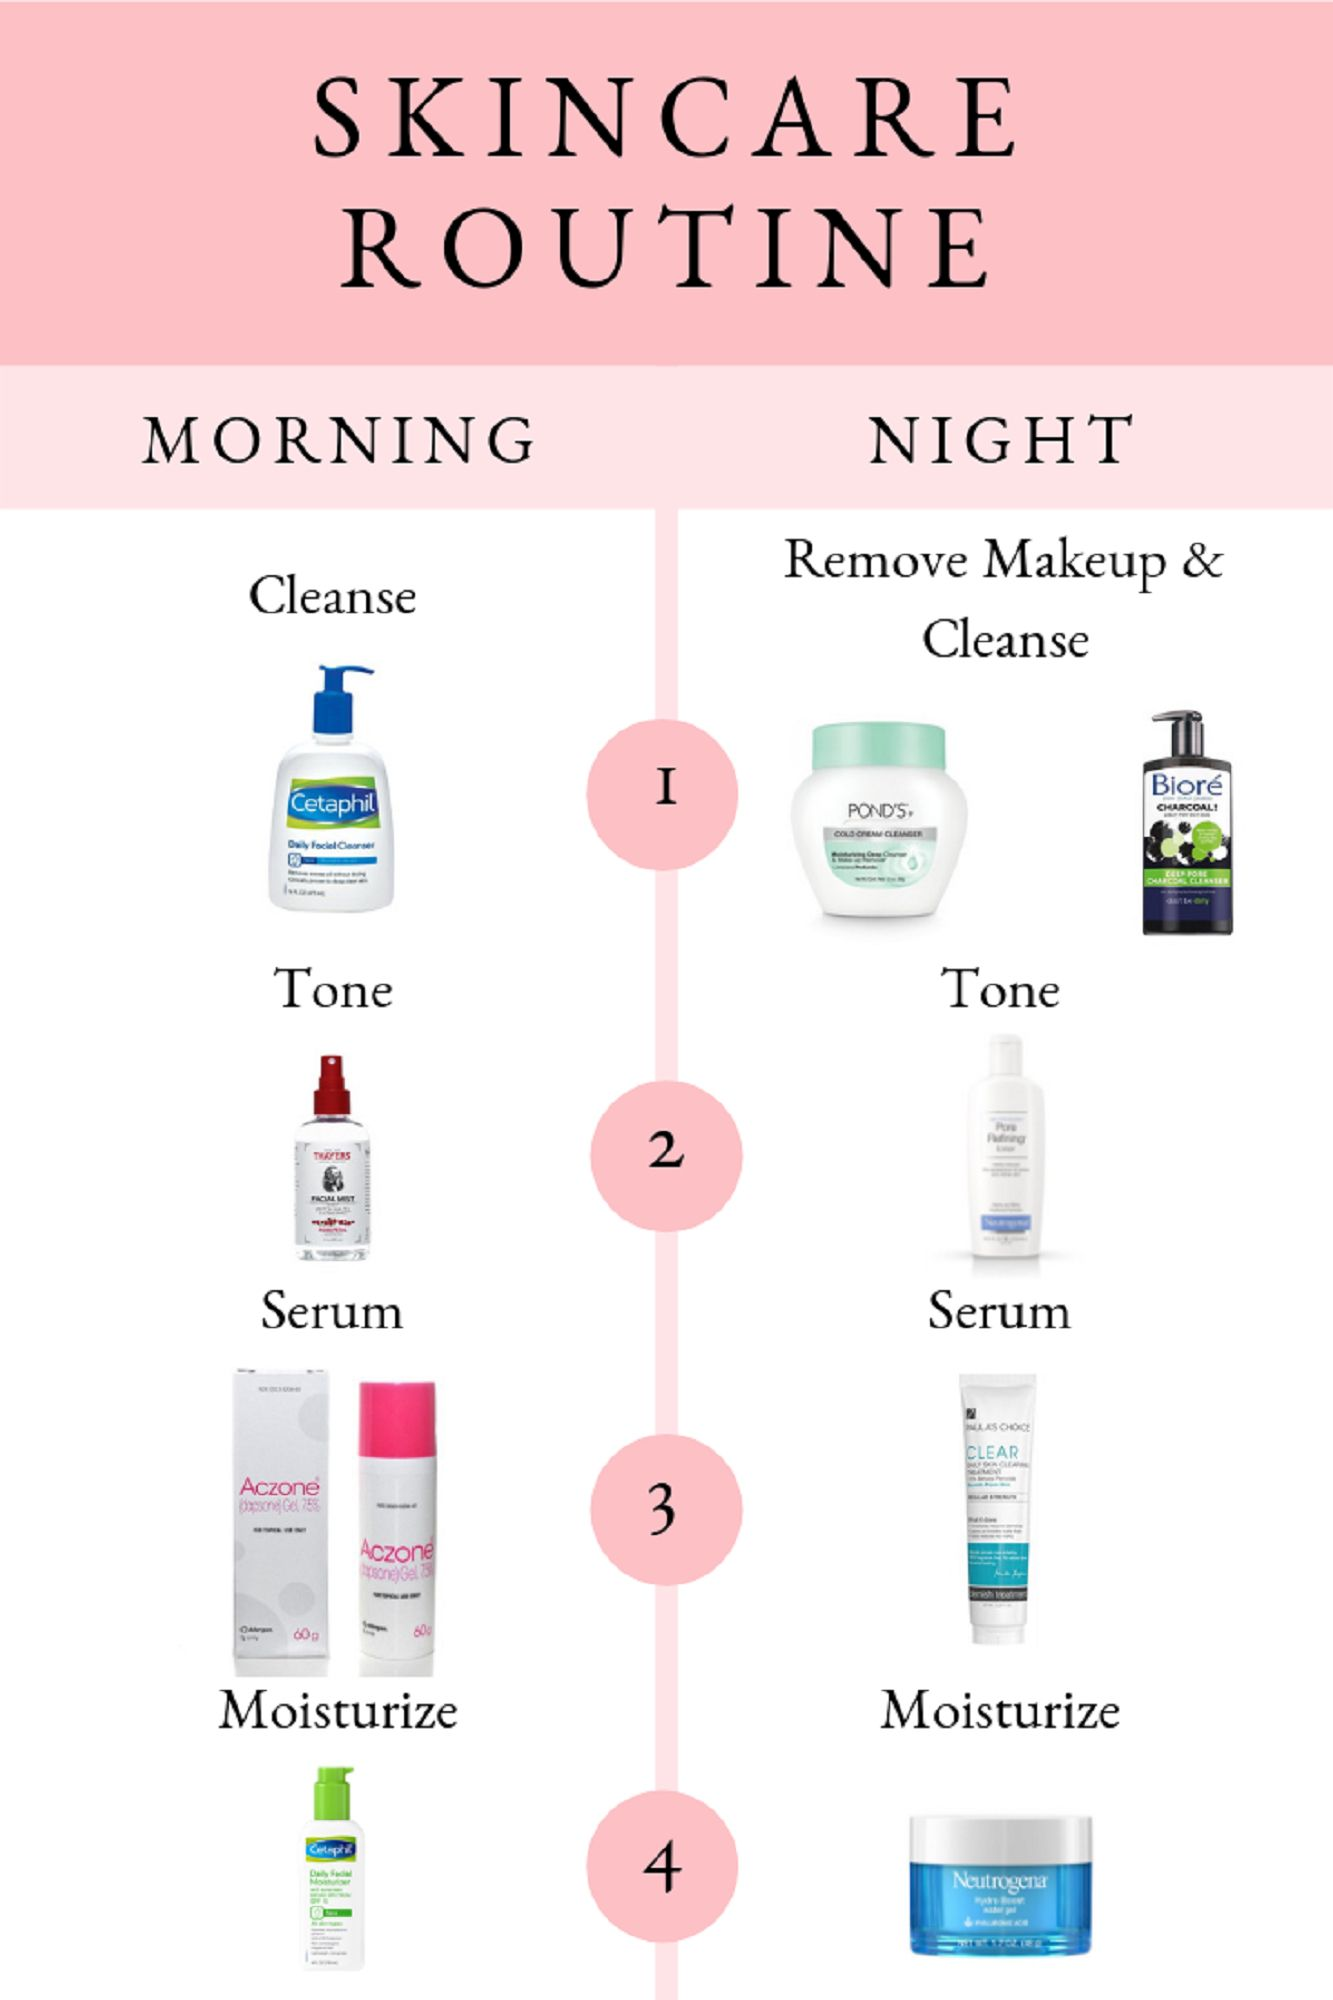 Morning and Night Skincare Routine Night skin care